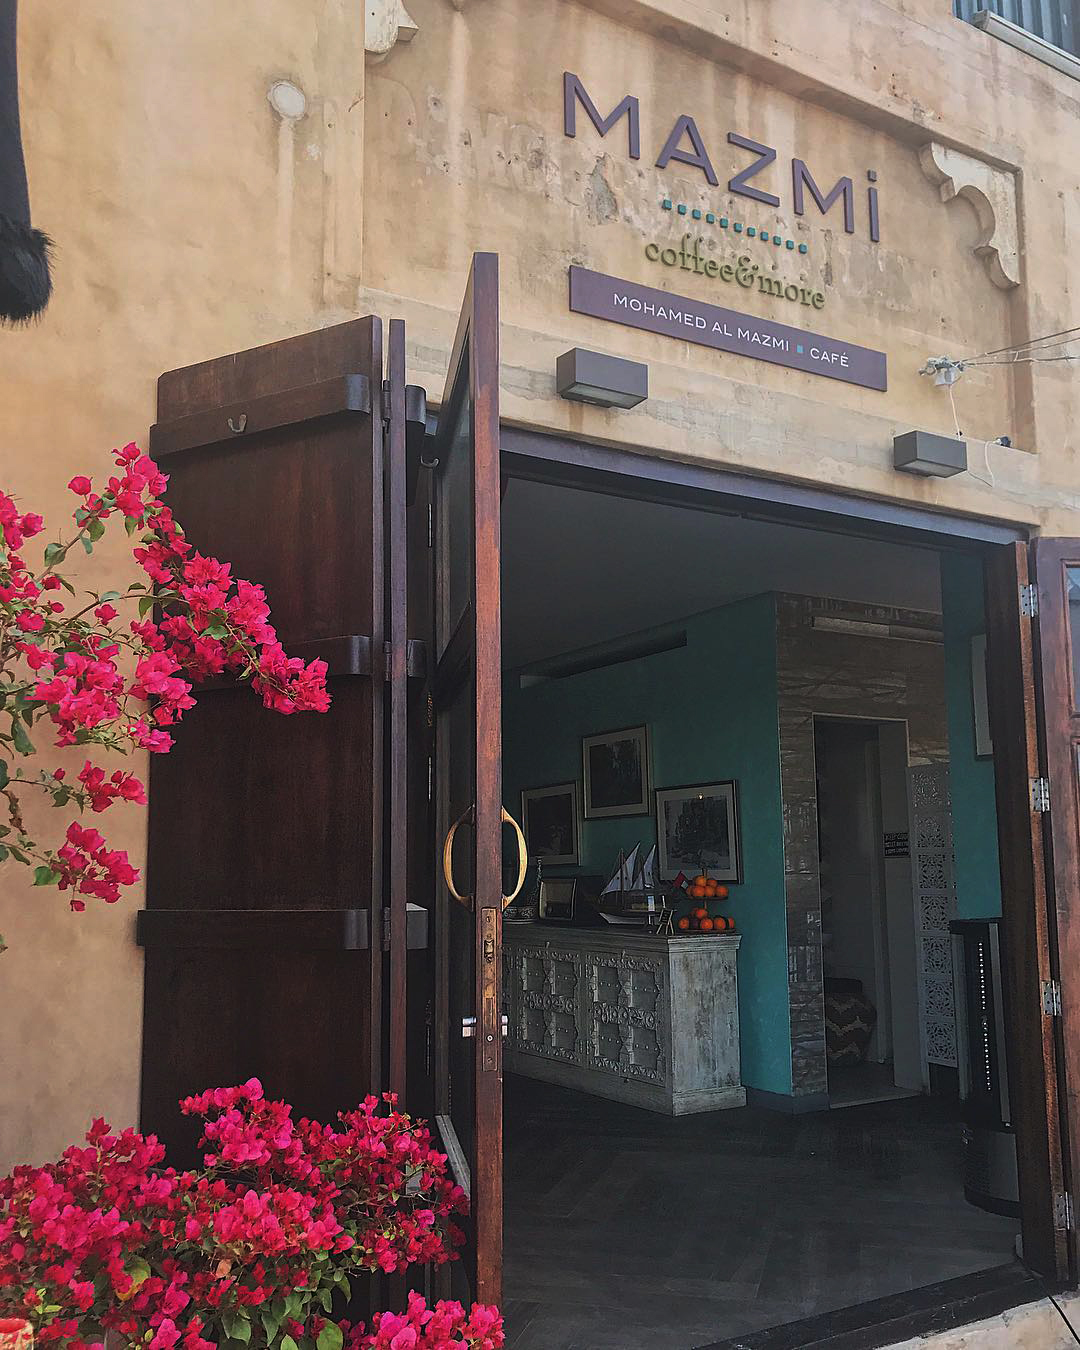 Insegna Mazmi Studio Talpa